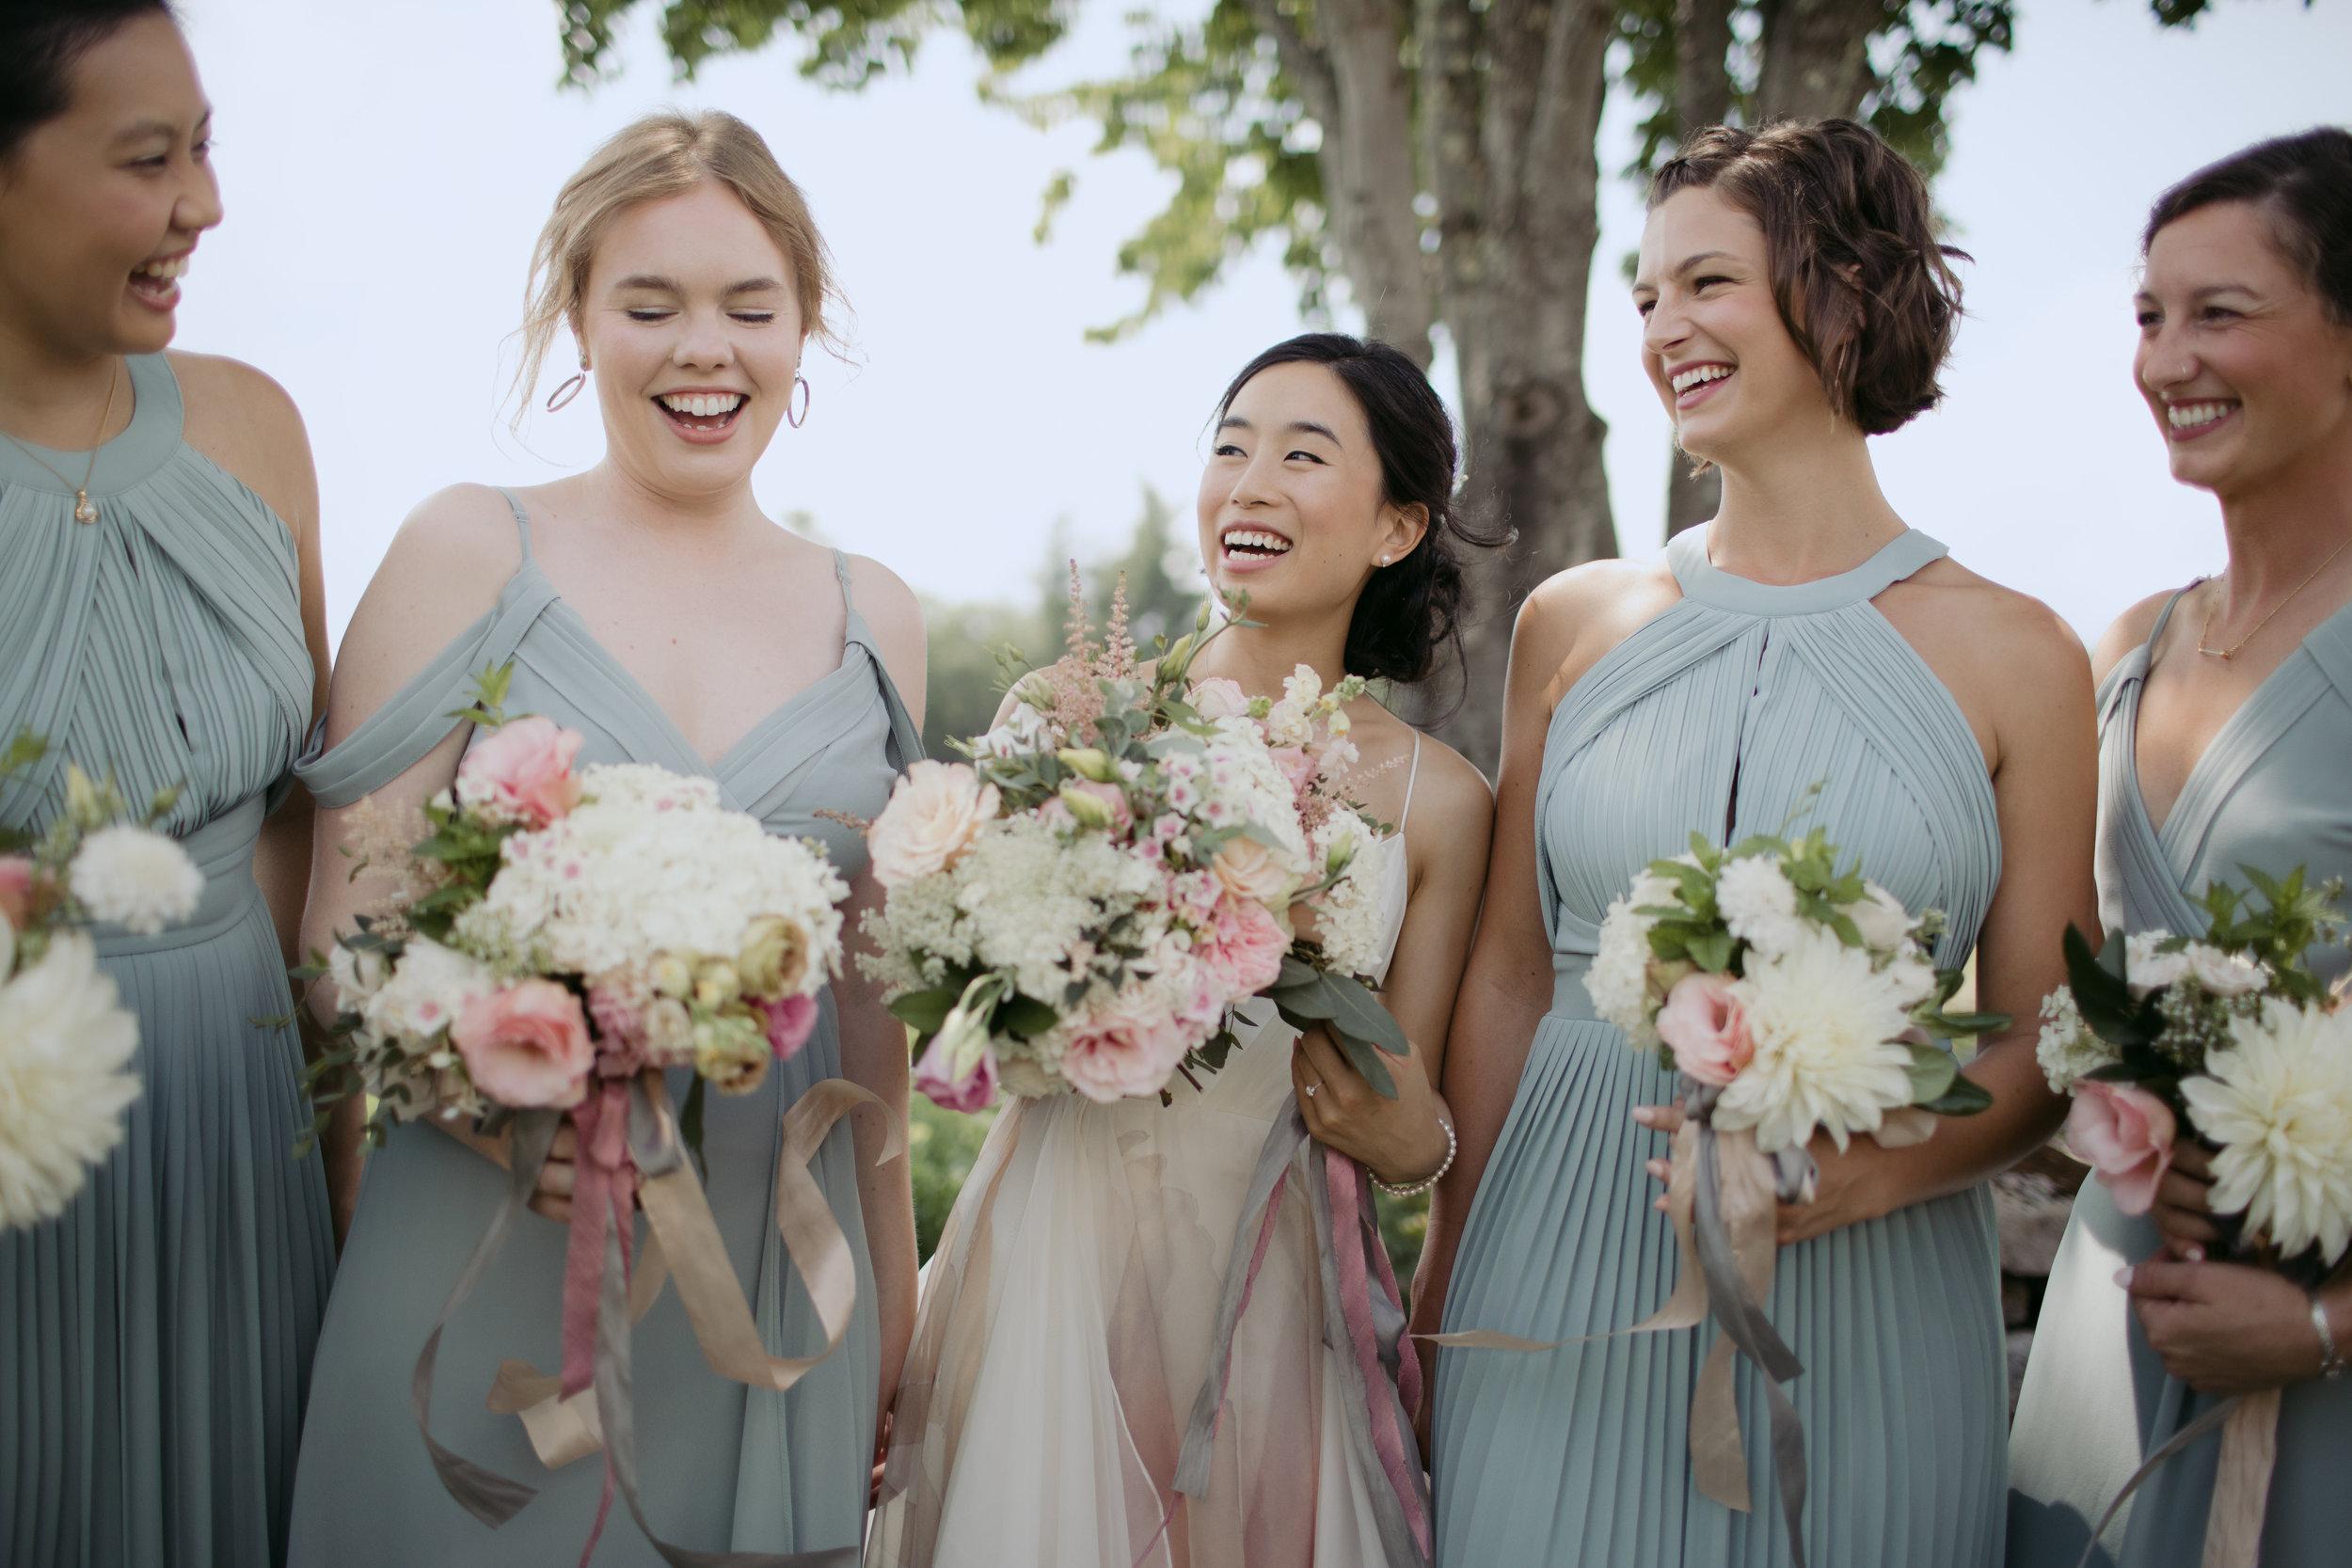 Watershed_Floral_Maine_Farm_Wedding-301.jpg